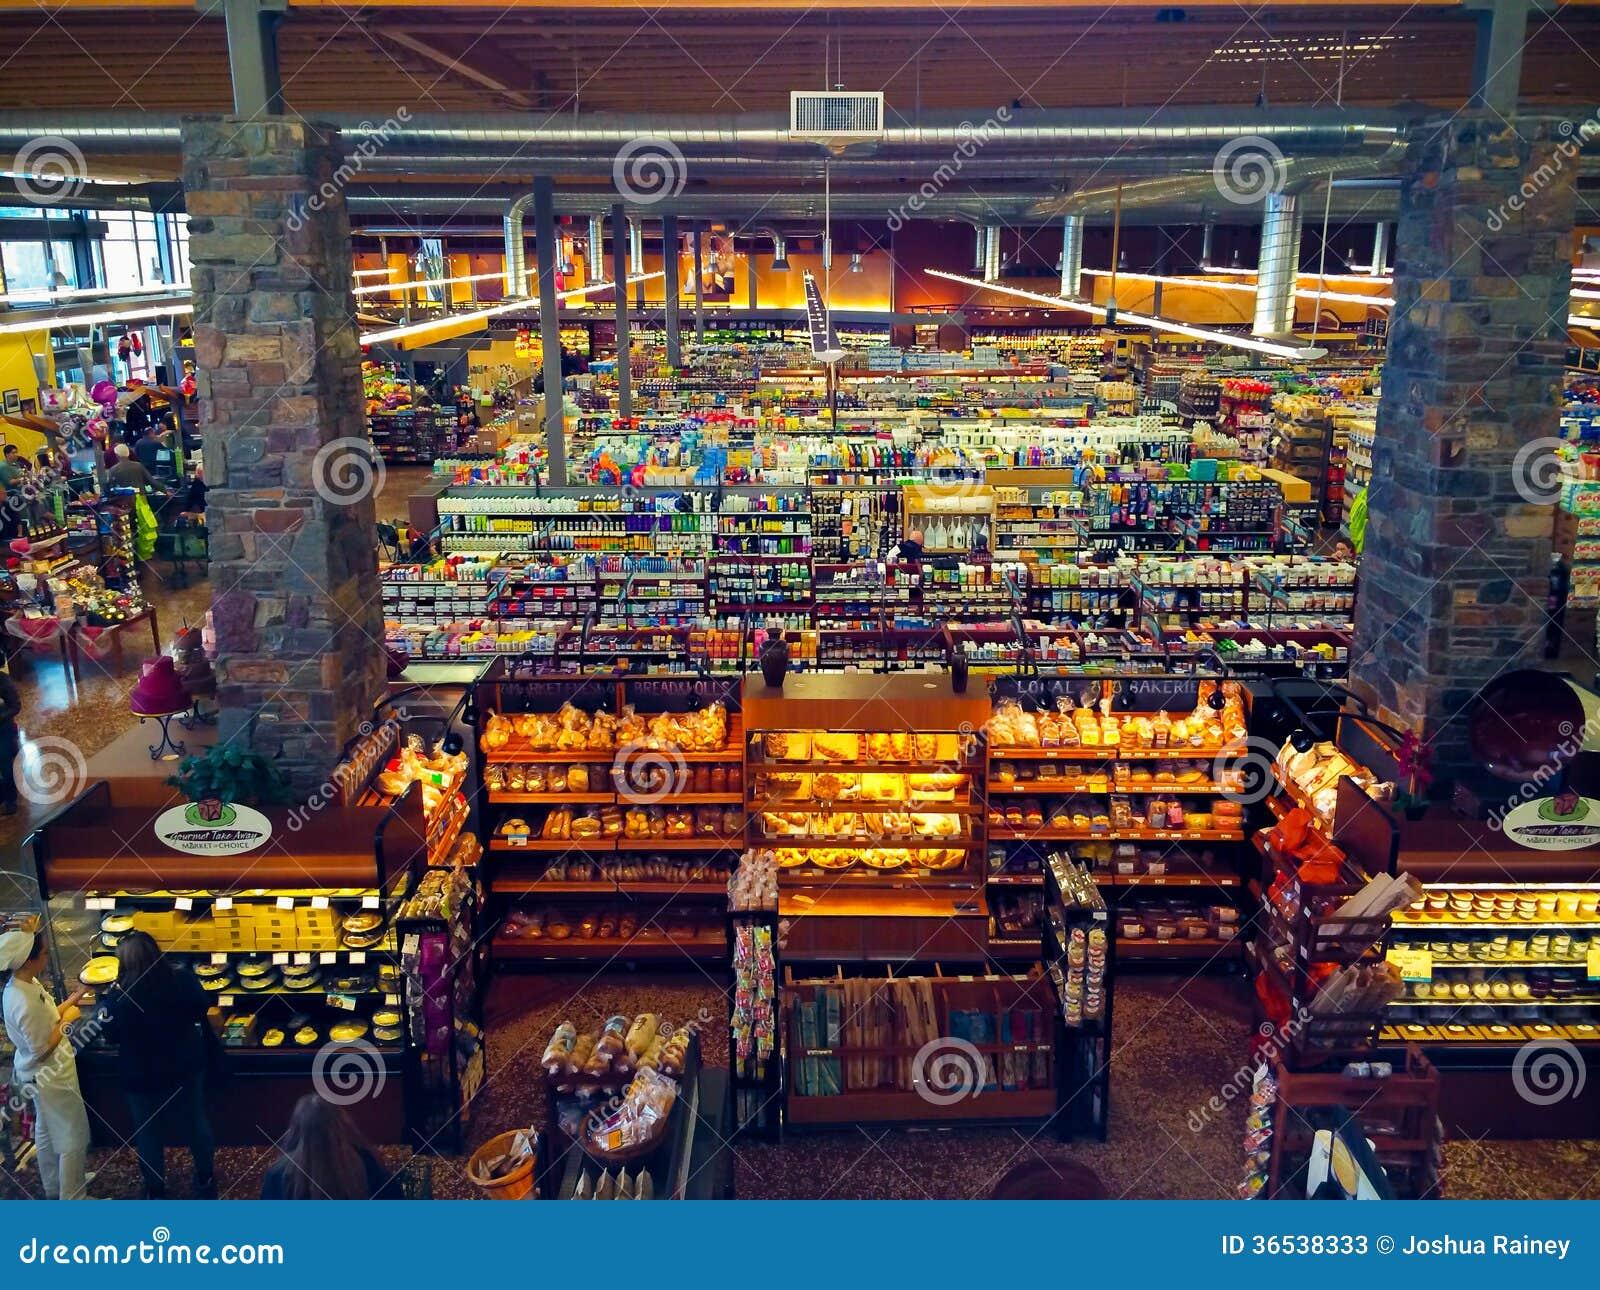 Market Of Choice Interior Eugene, OR Editorial Stock Photo - Image: 36538333